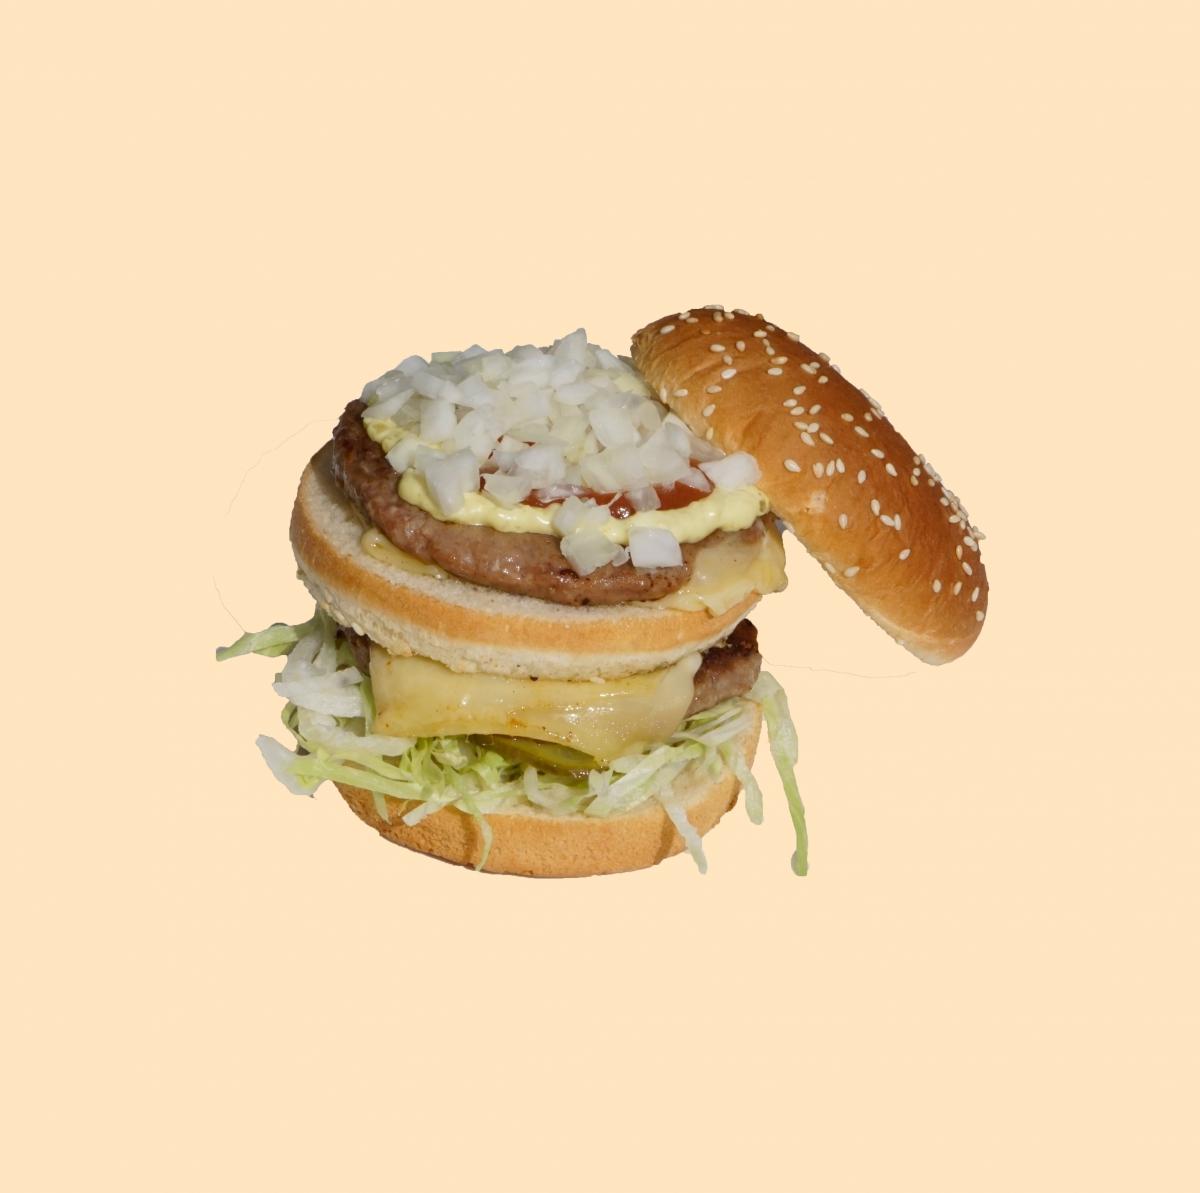 Dubbel burger cheese